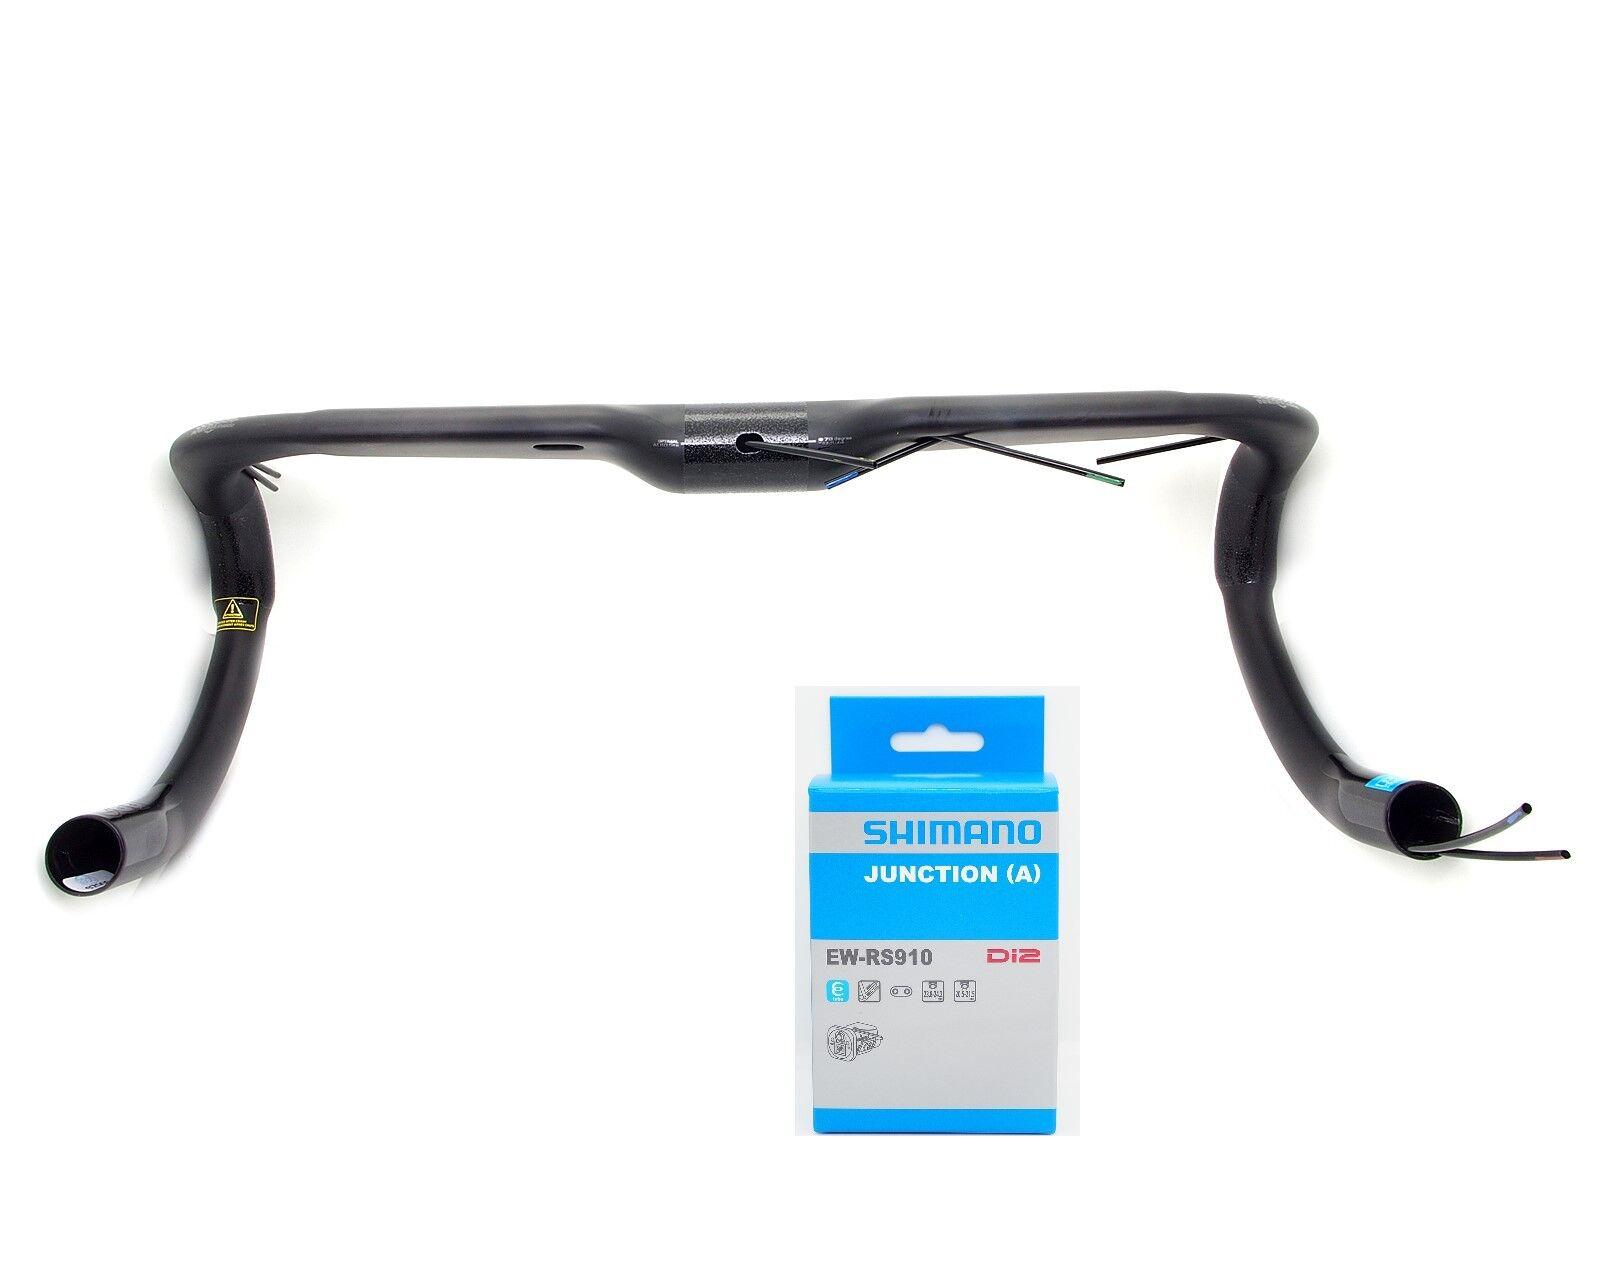 New Shimano PRO Vibe Aero Carbon  Compact Handlebar 40cm w  EW-RS910 Di2 Junction  discount store